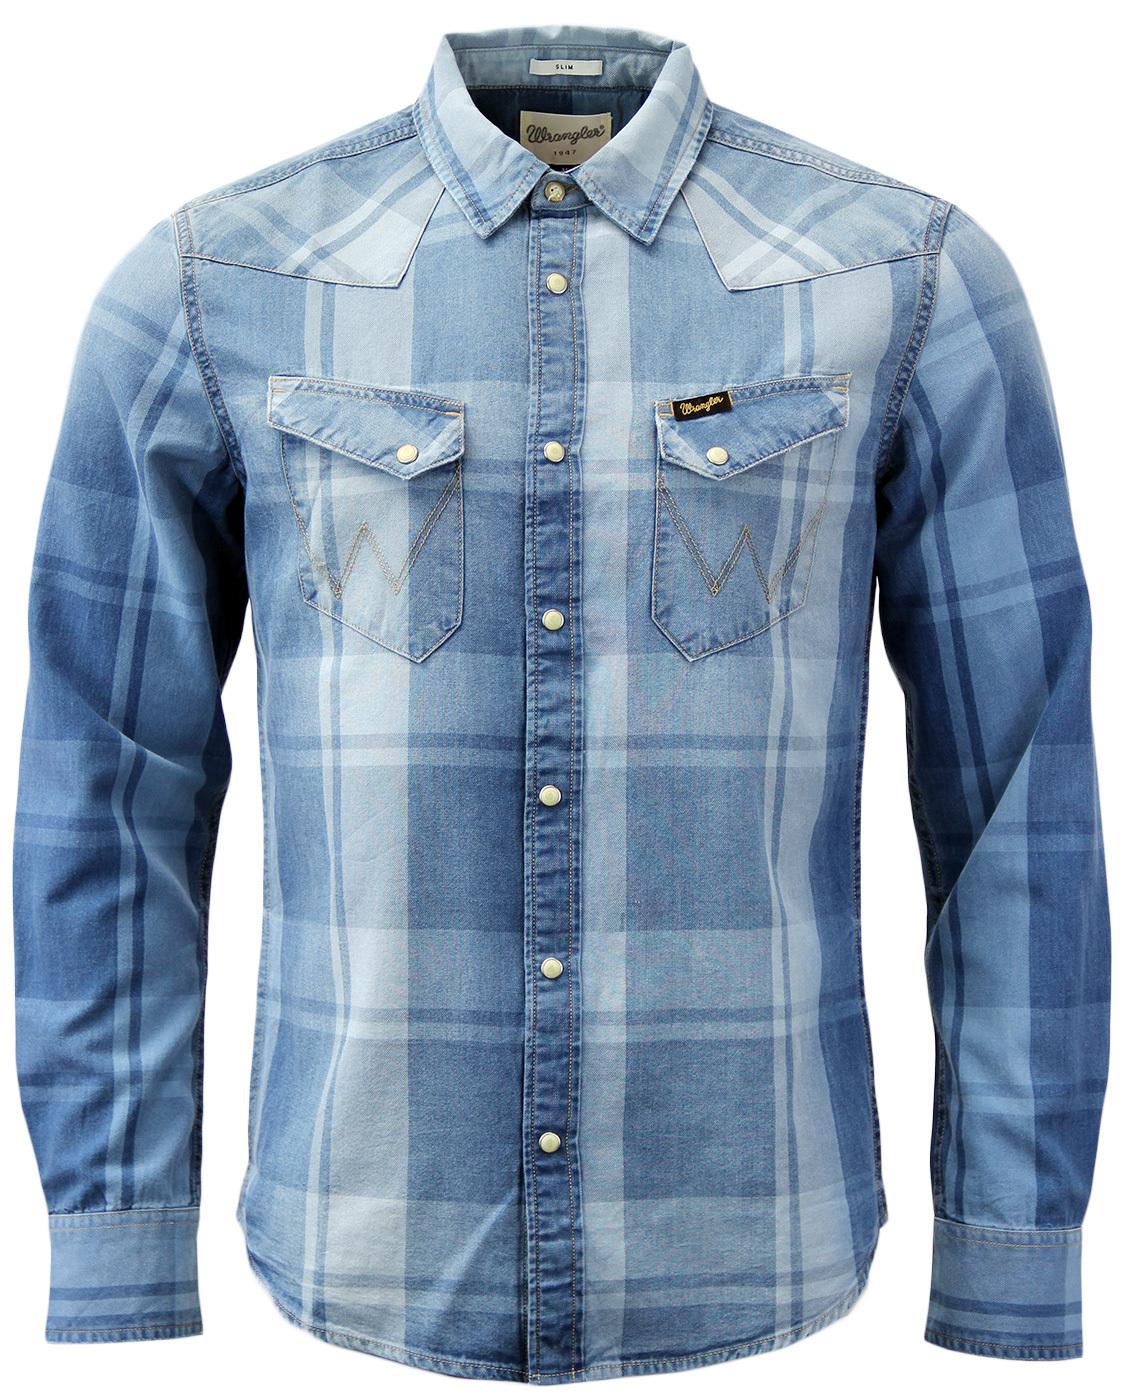 Wrangler indigo dye retro indie mens denim check shirt in for Wrangler denim shirts uk